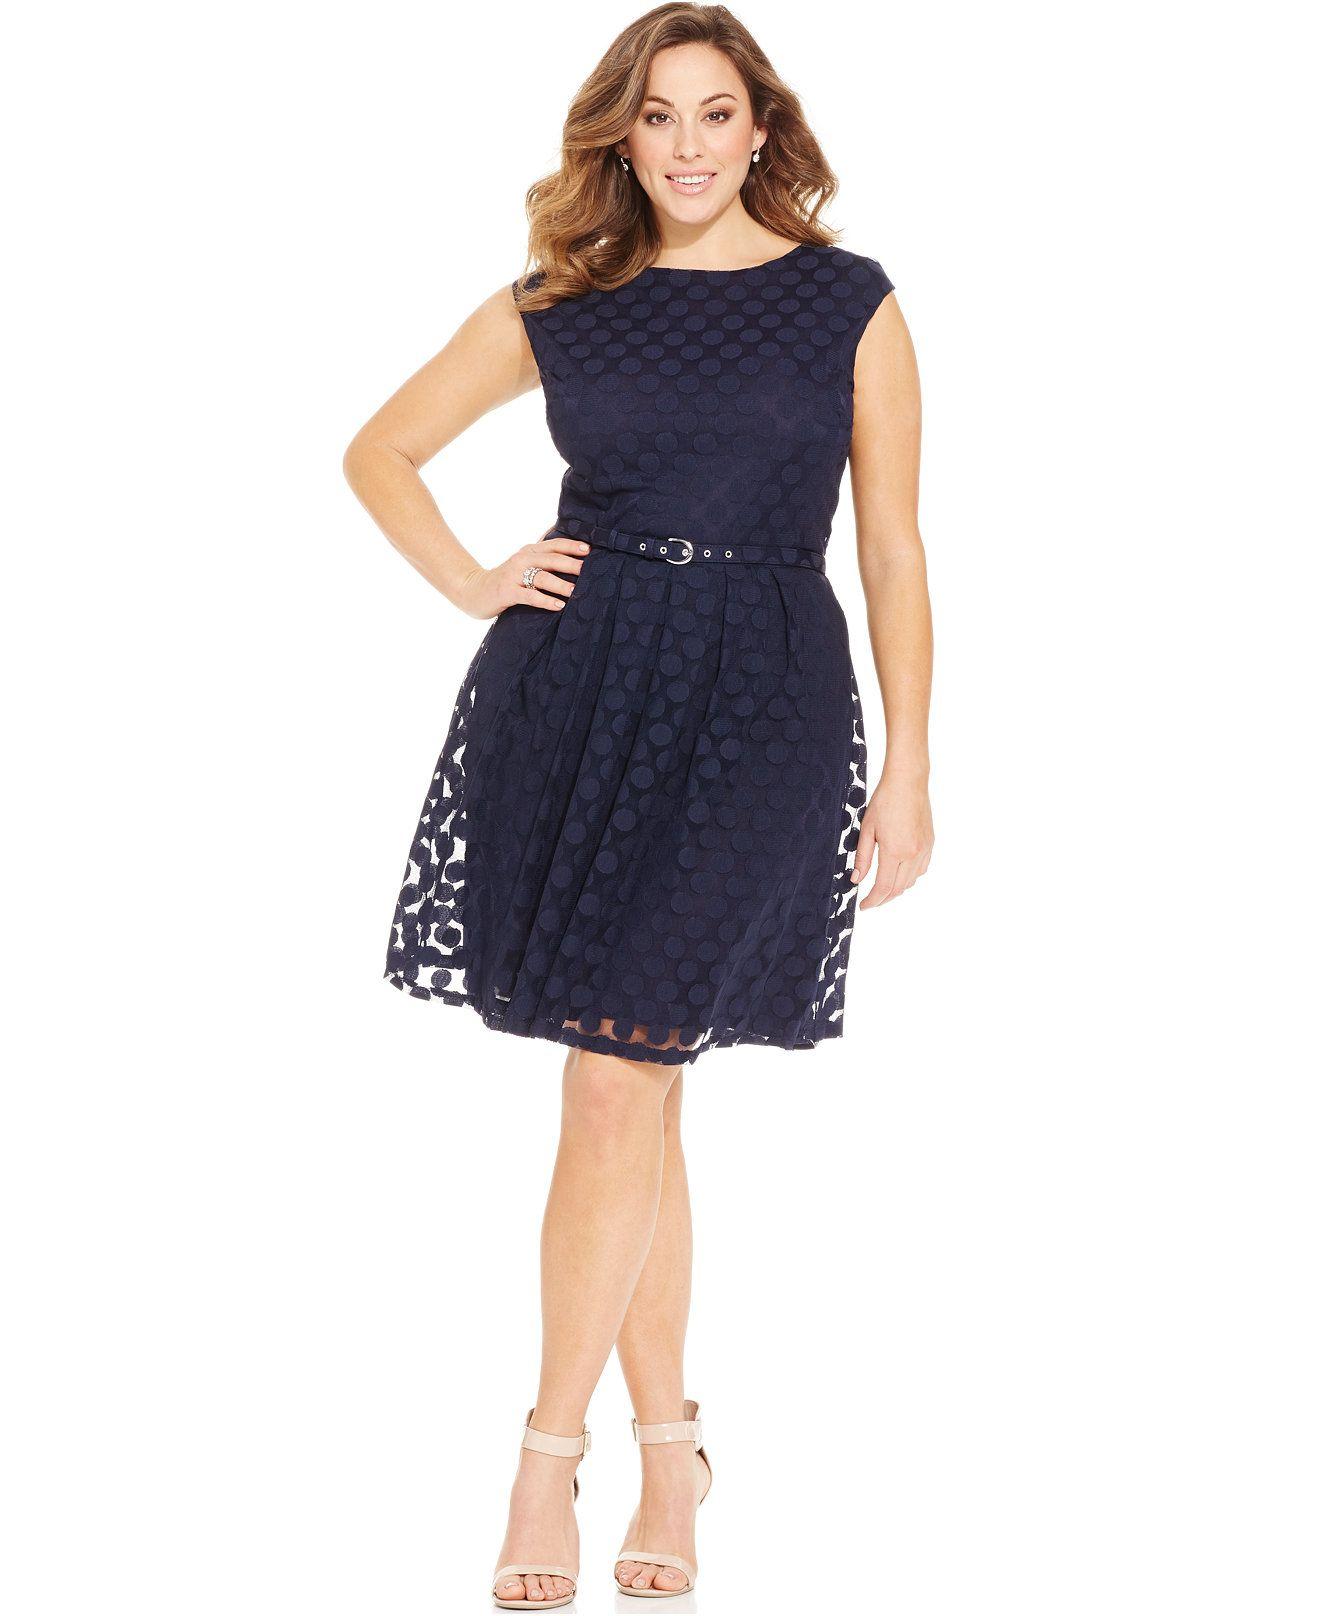 macy s dresses plus size - Heart.impulsar.co